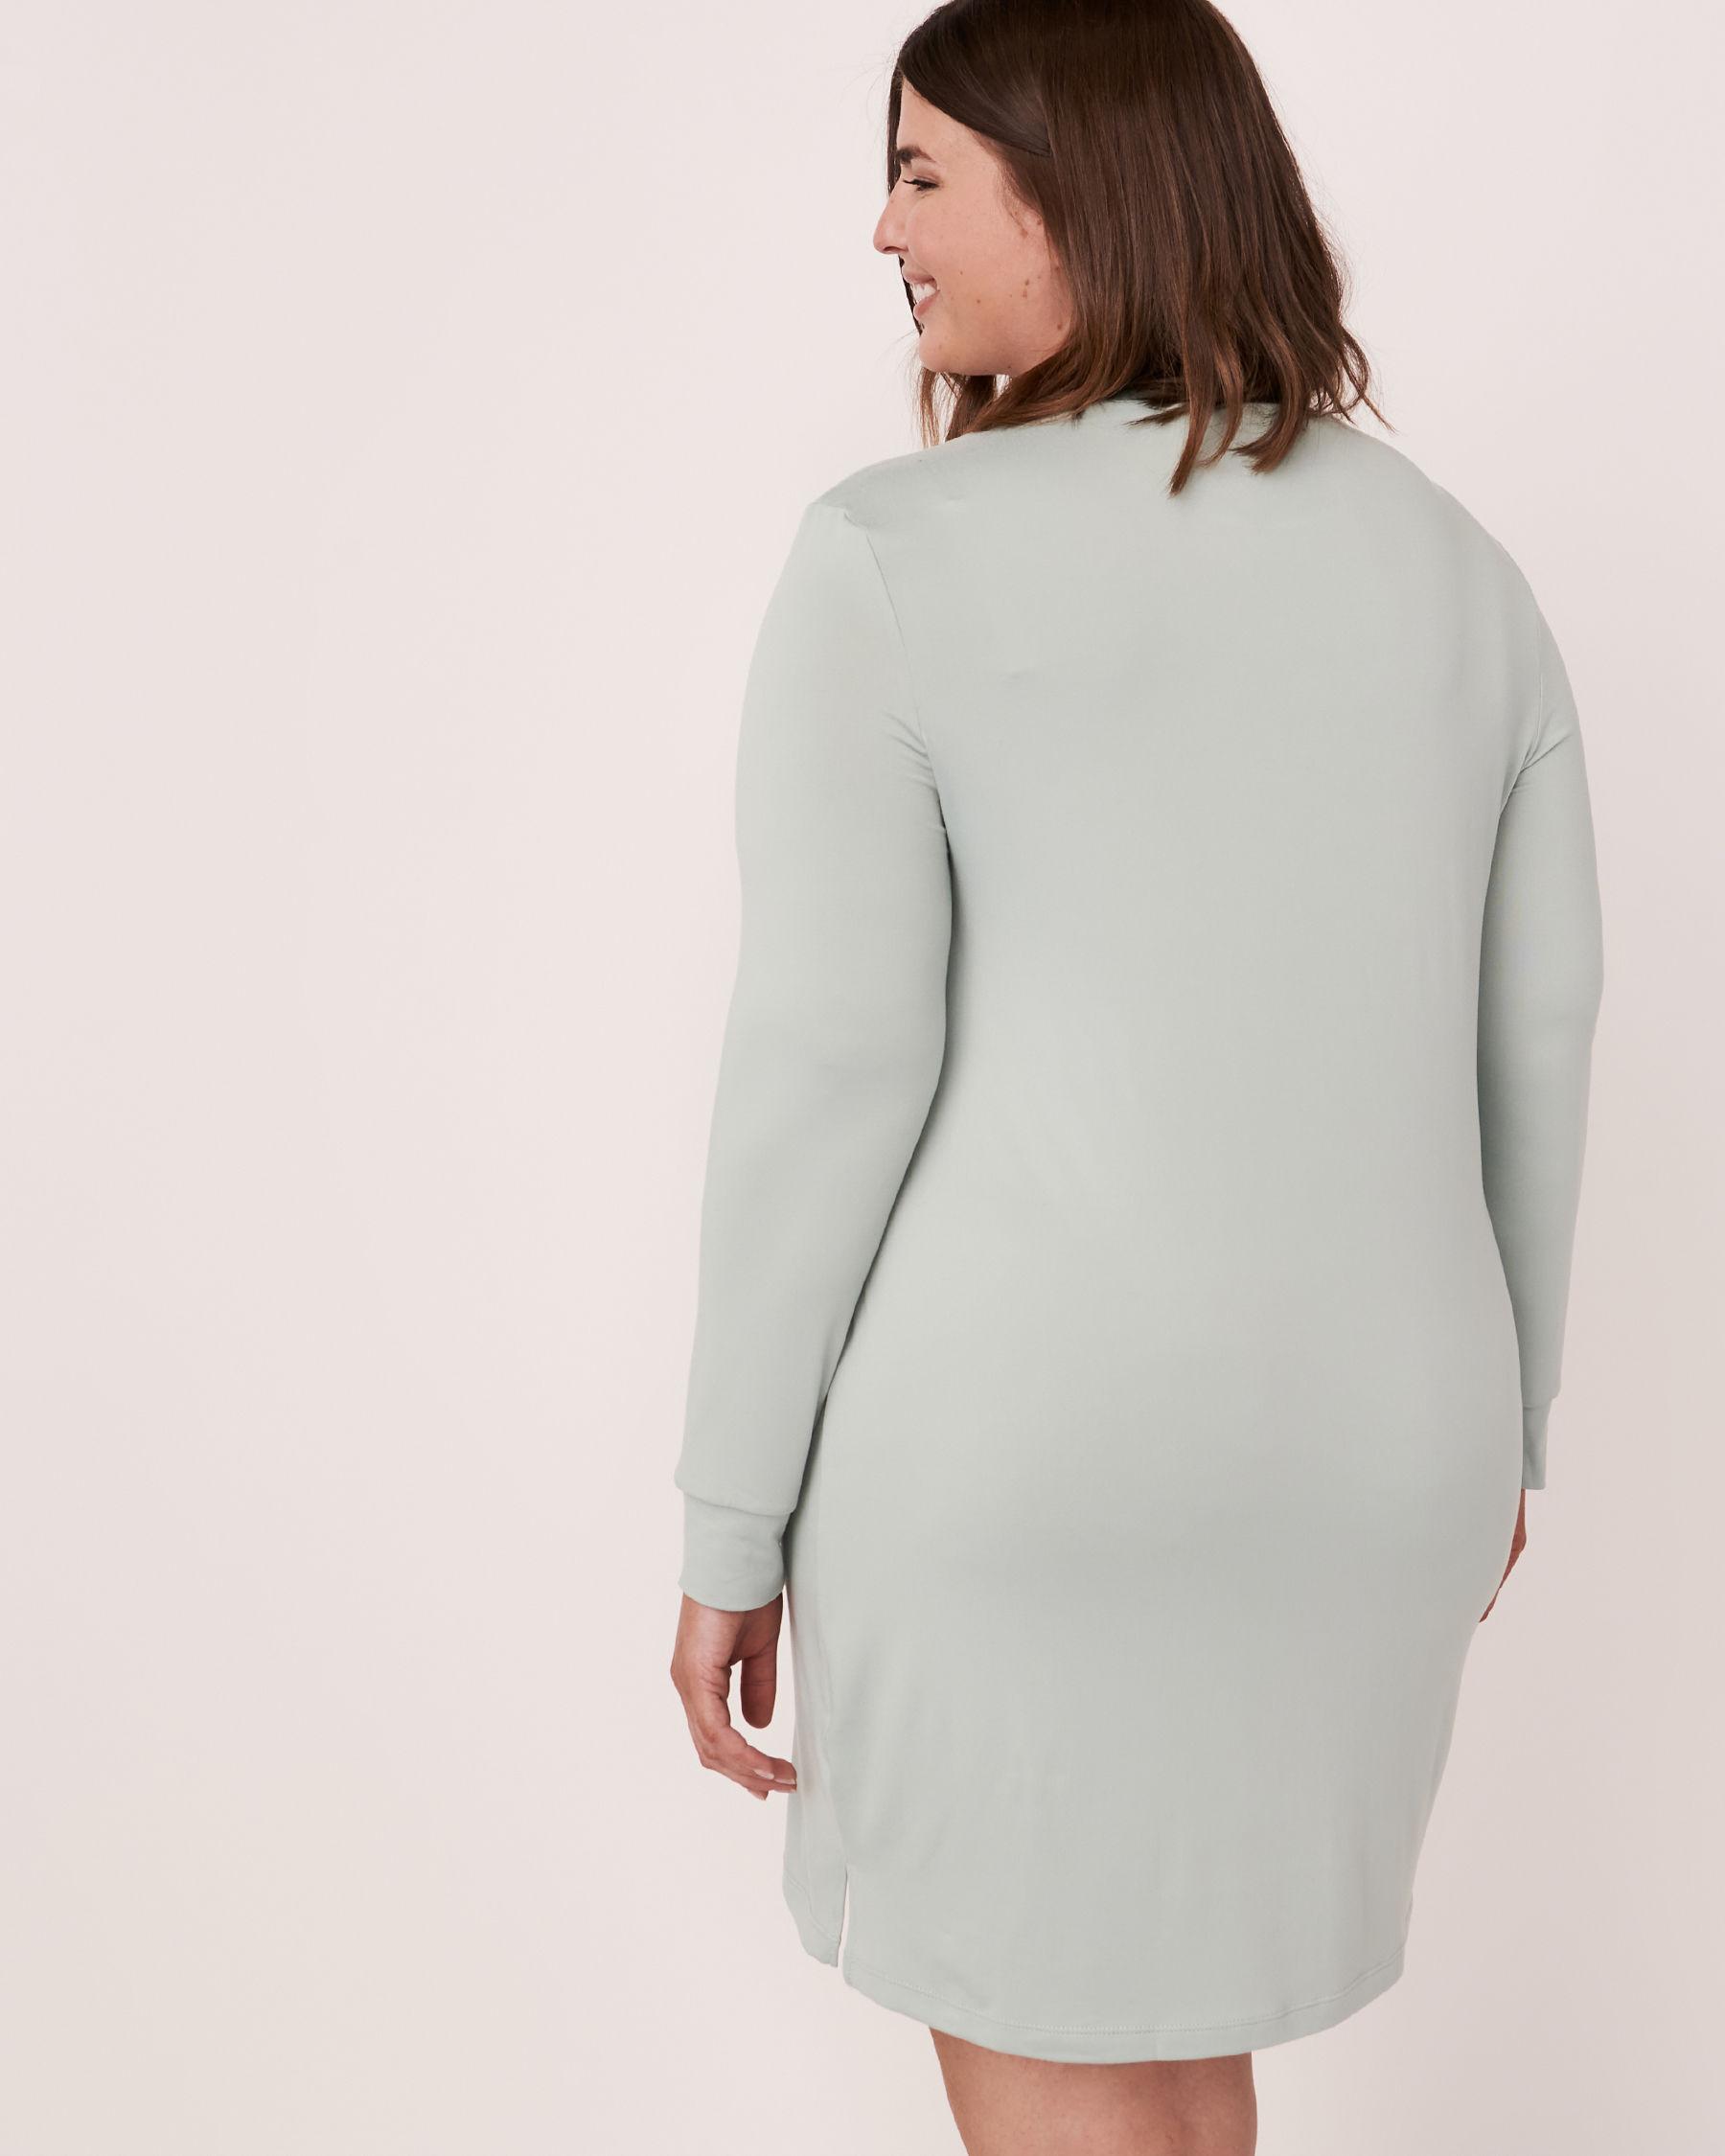 LA VIE EN ROSE High Neck Long Sleeve Sleepshirt Green 40500076 - View3